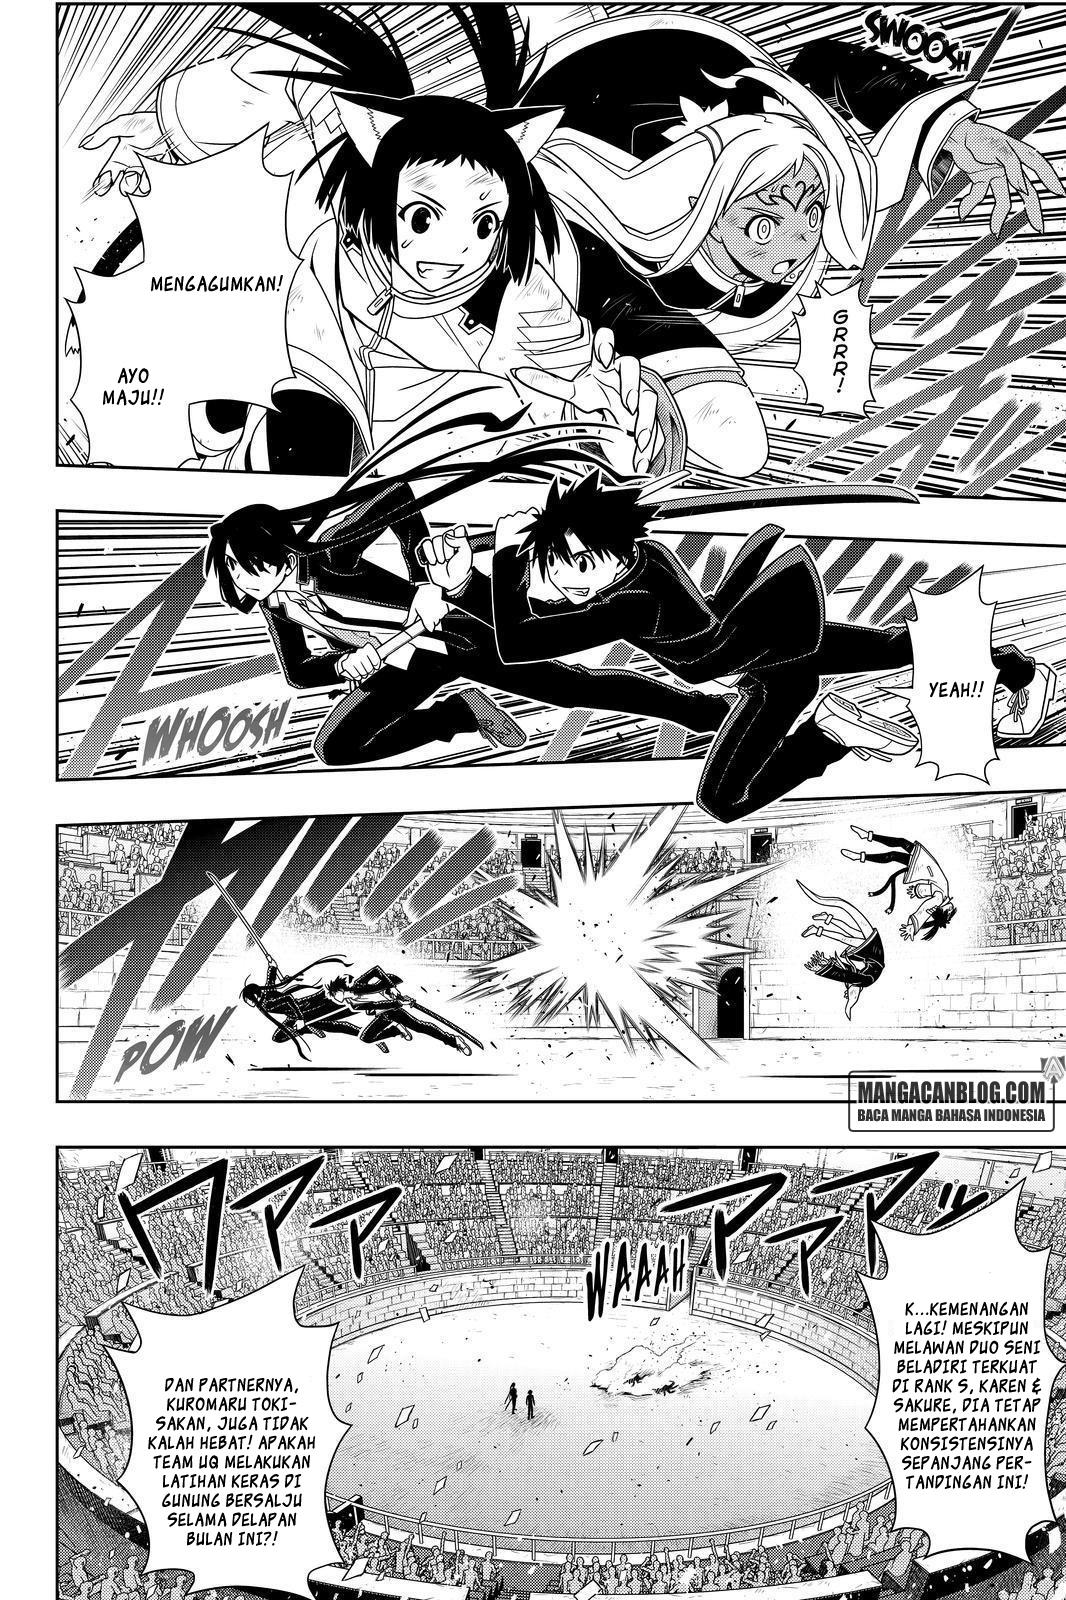 Komik uq holder 117 - kau diaktifkan oleh itu 118 Indonesia uq holder 117 - kau diaktifkan oleh itu Terbaru 4 Baca Manga Komik Indonesia